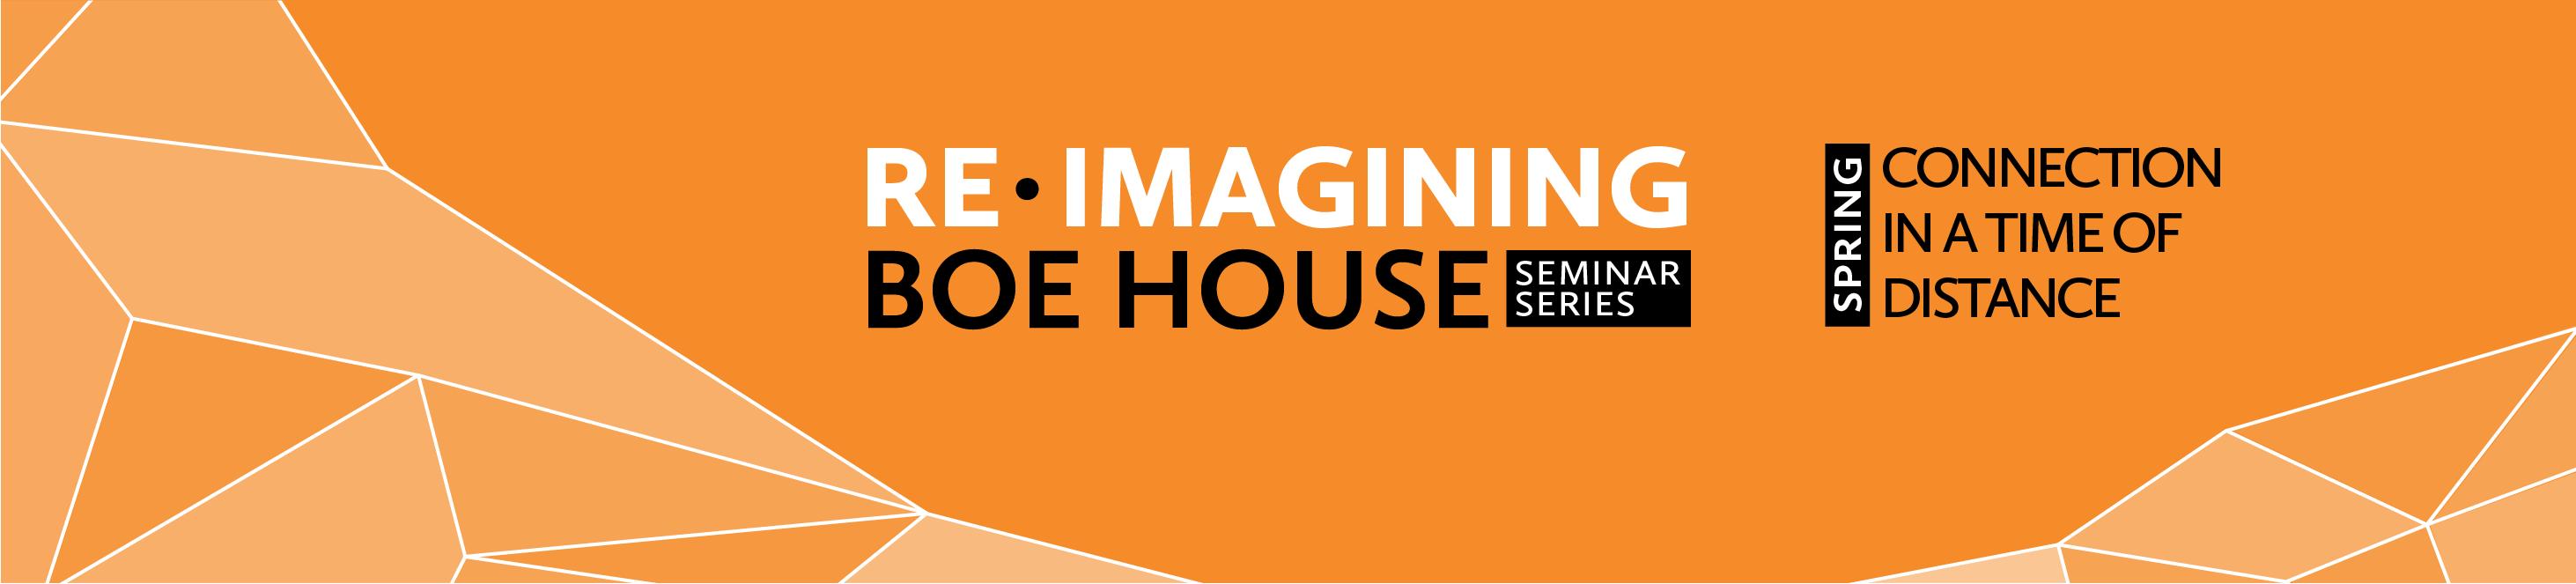 Re-Imagining Boe House Seminar Series